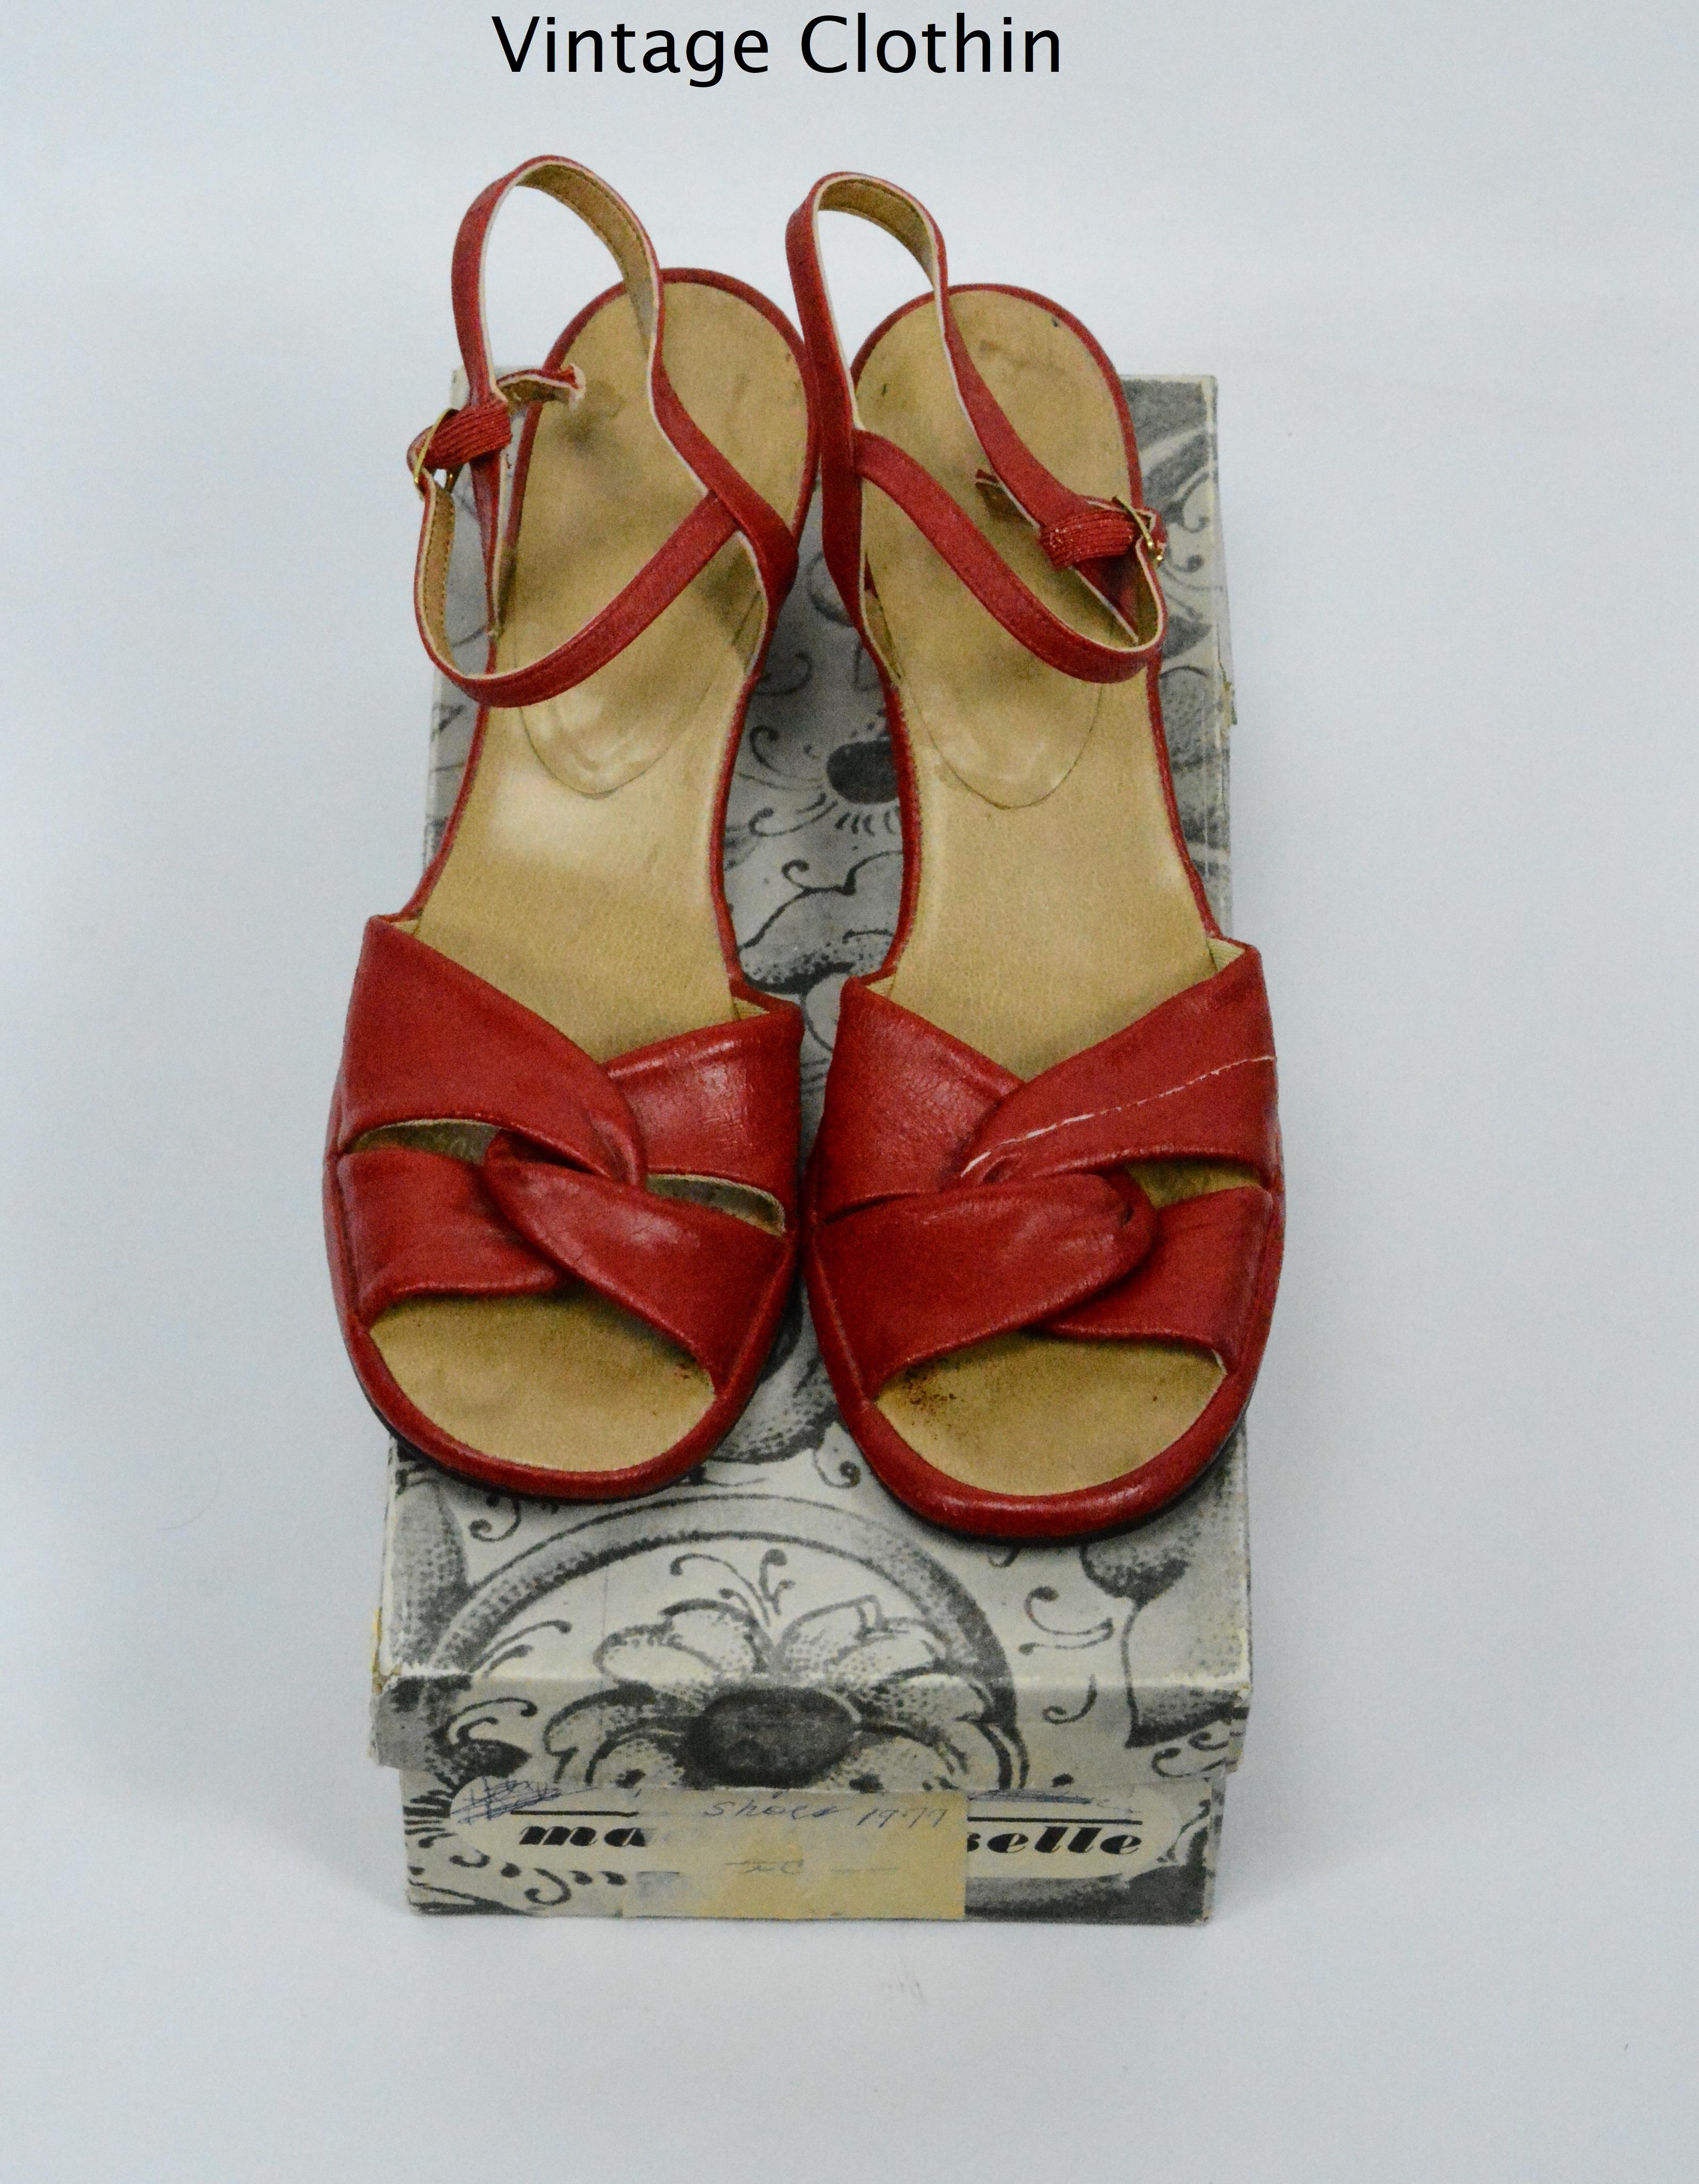 19870s vintage red sandals – Women's